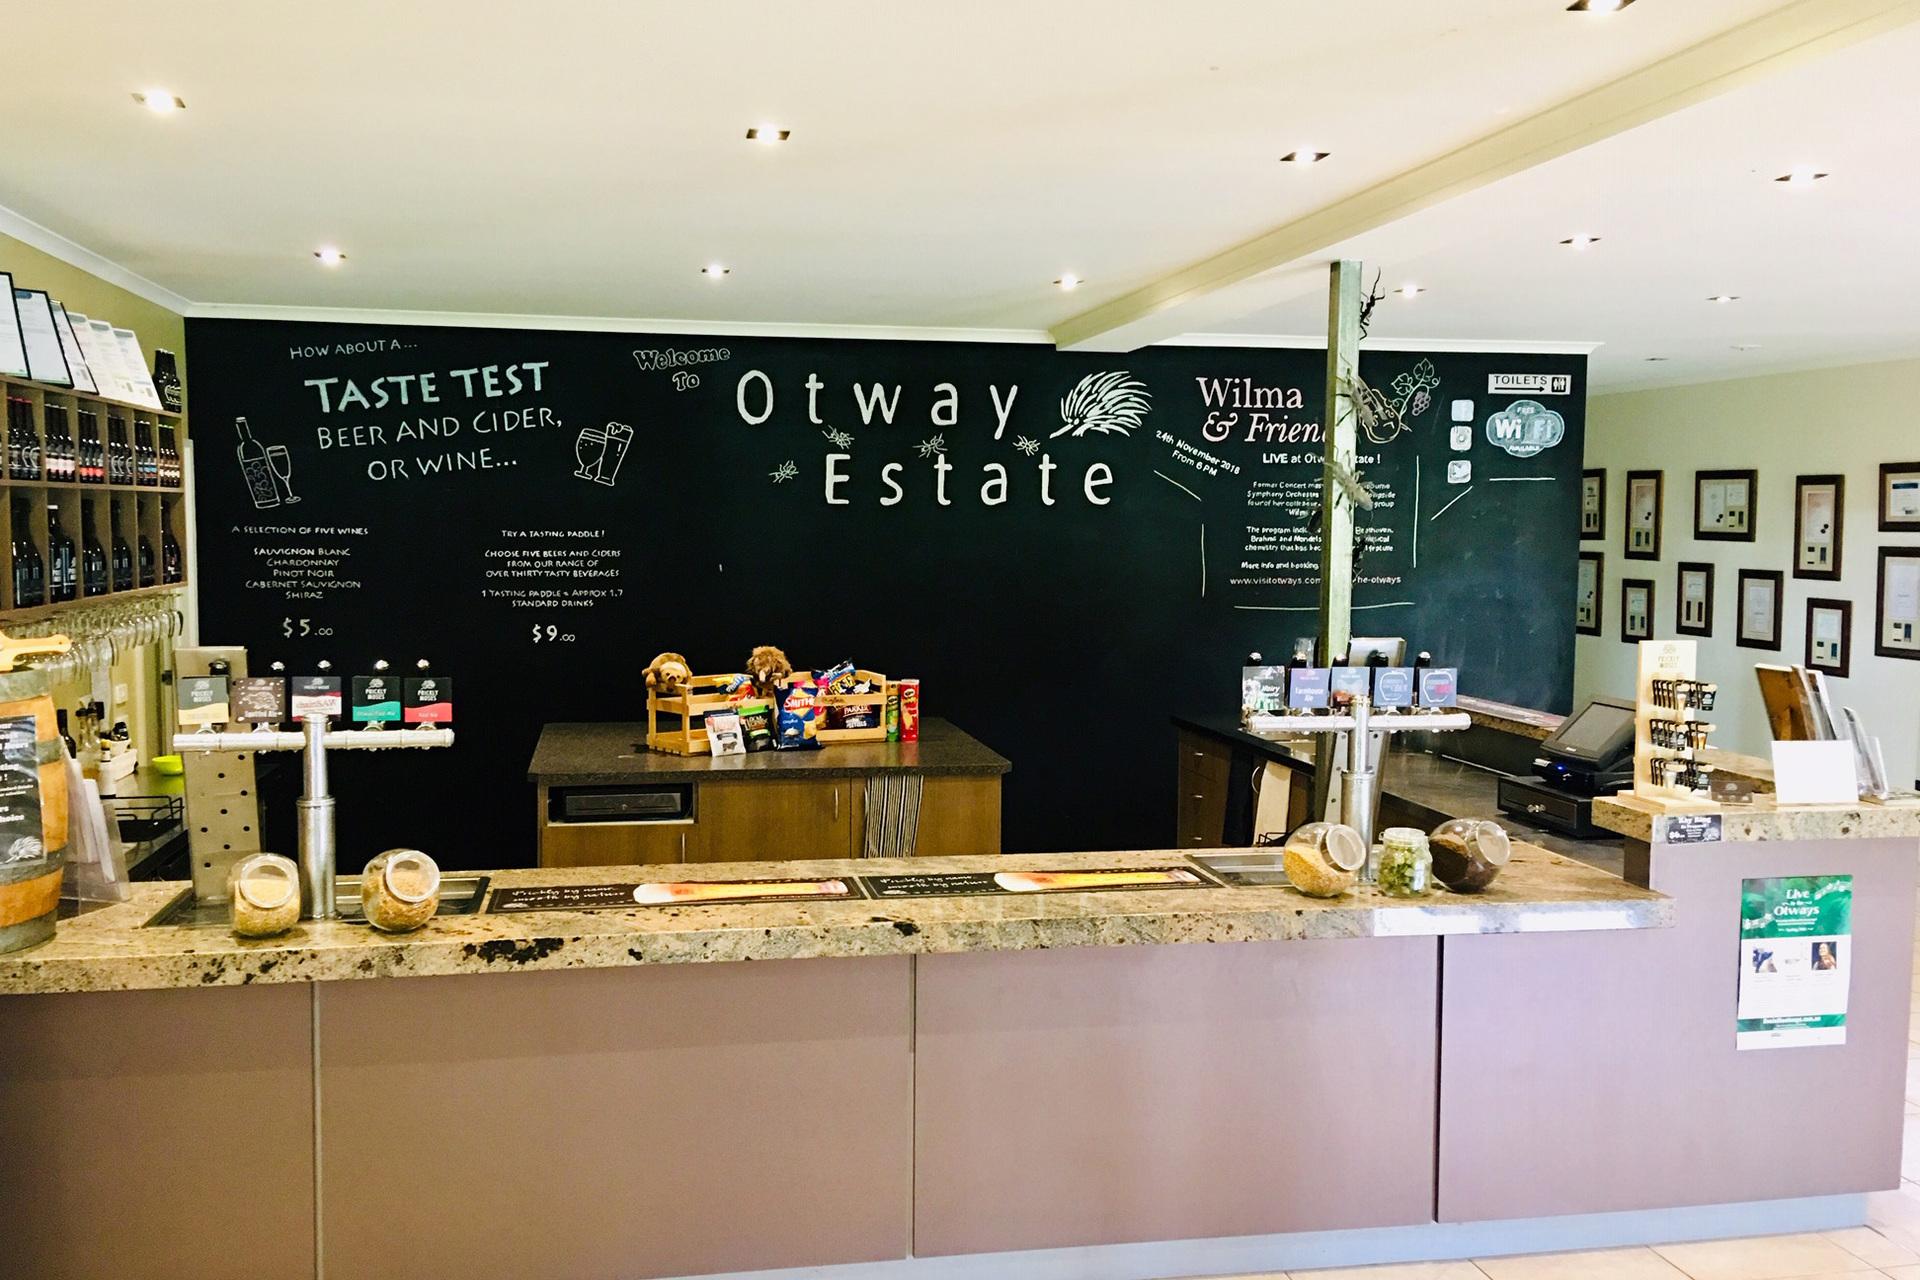 h - Otway Estate Cafe & Restaurant